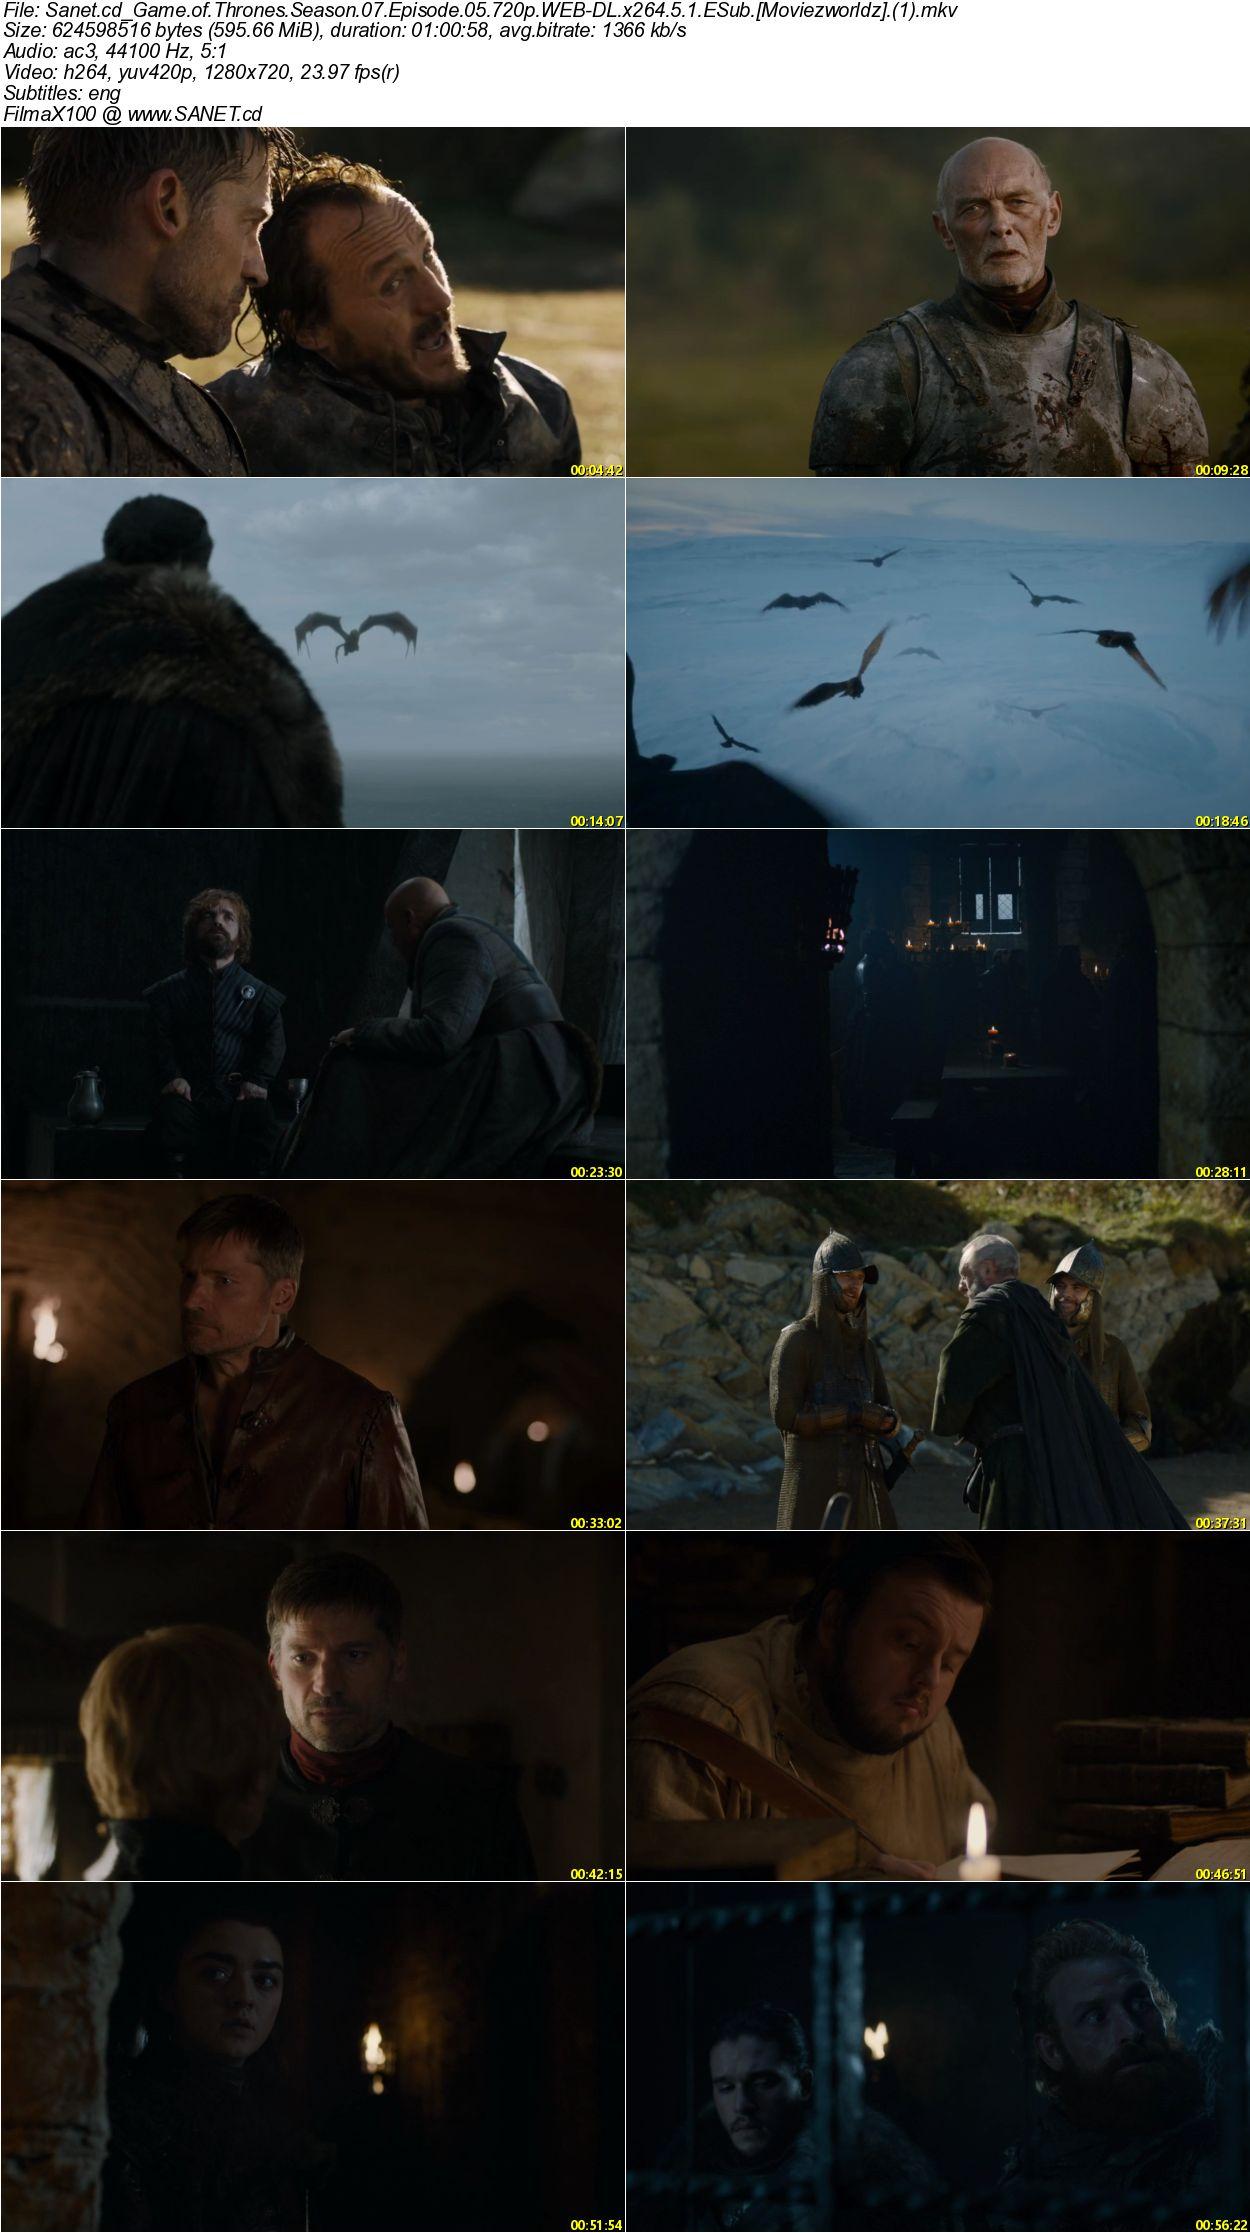 Game of thrones Season 3 720p Bluray